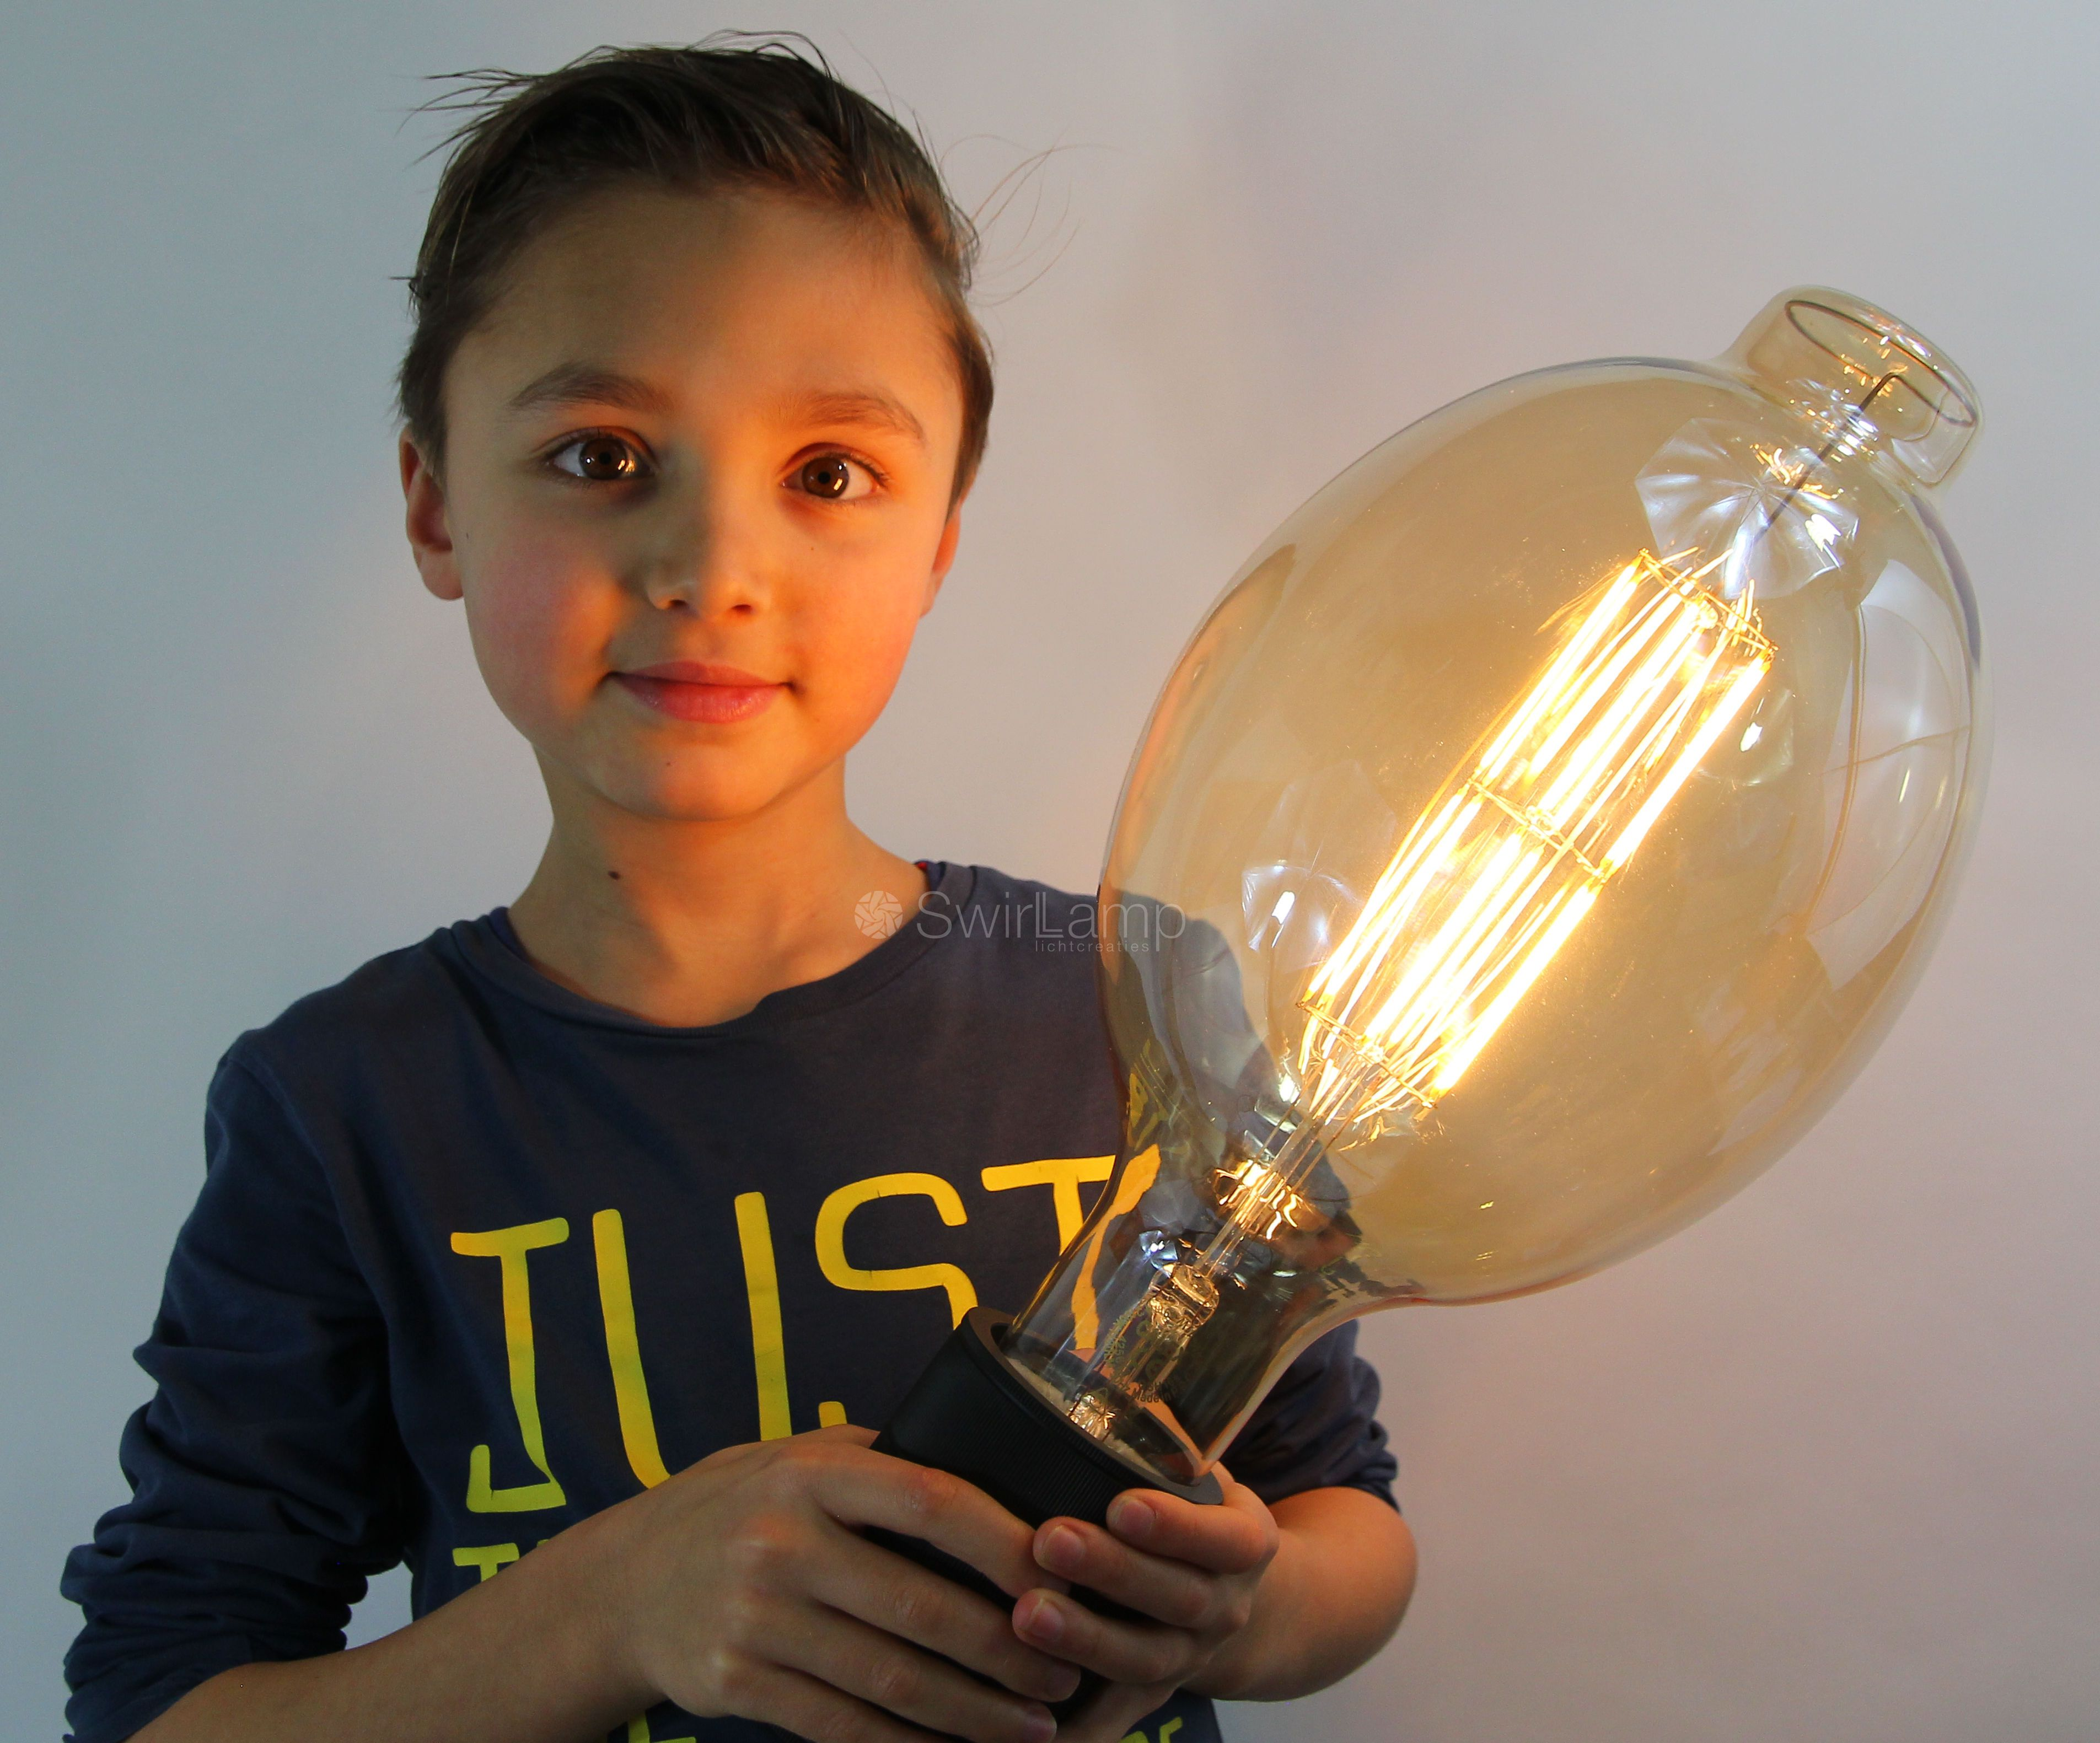 Calex Lampen Action : Calex colosseum giant led filament lamp ideias para o